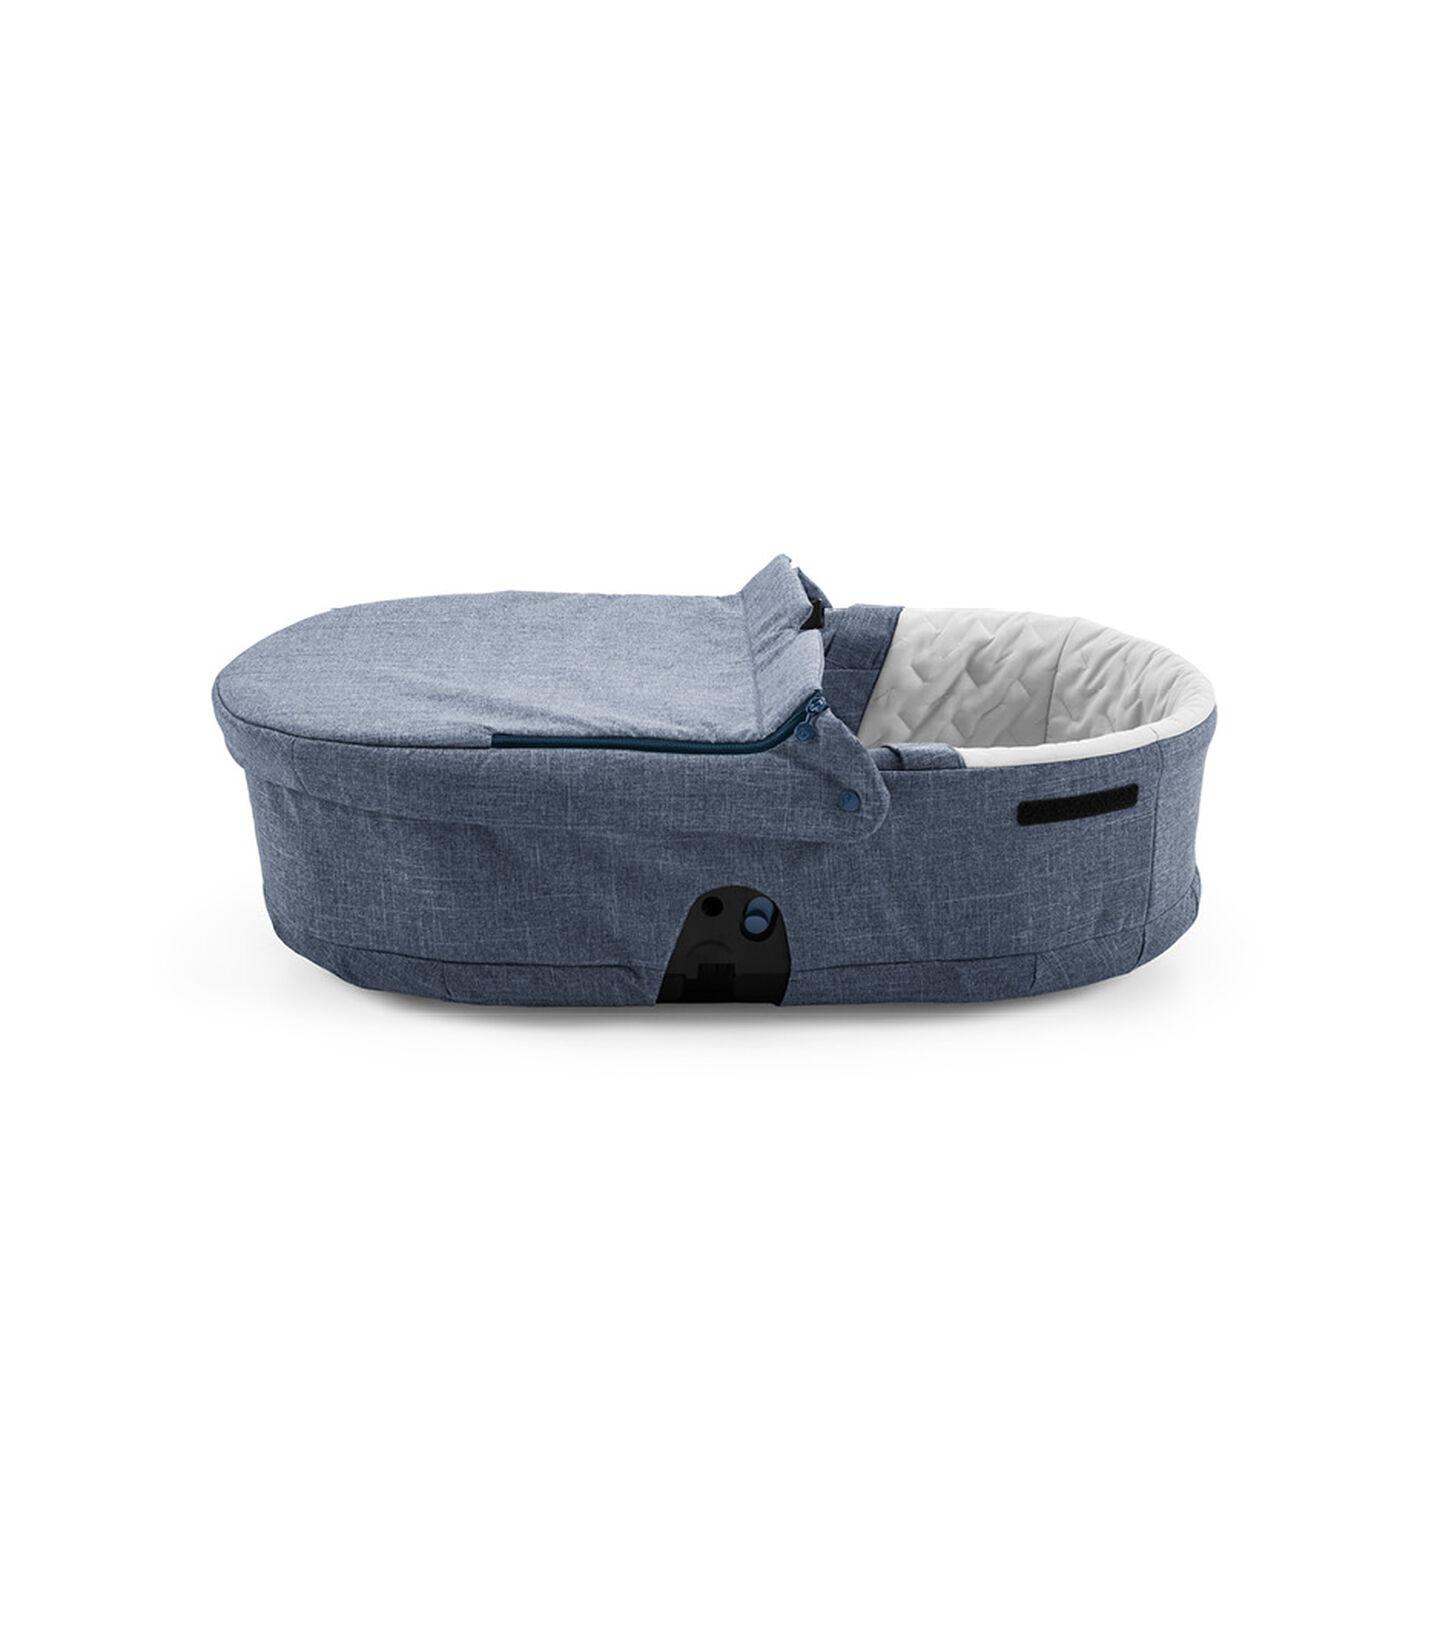 Stokke® Beat Carry Cot Blue Melange, Azul Melange, mainview view 2